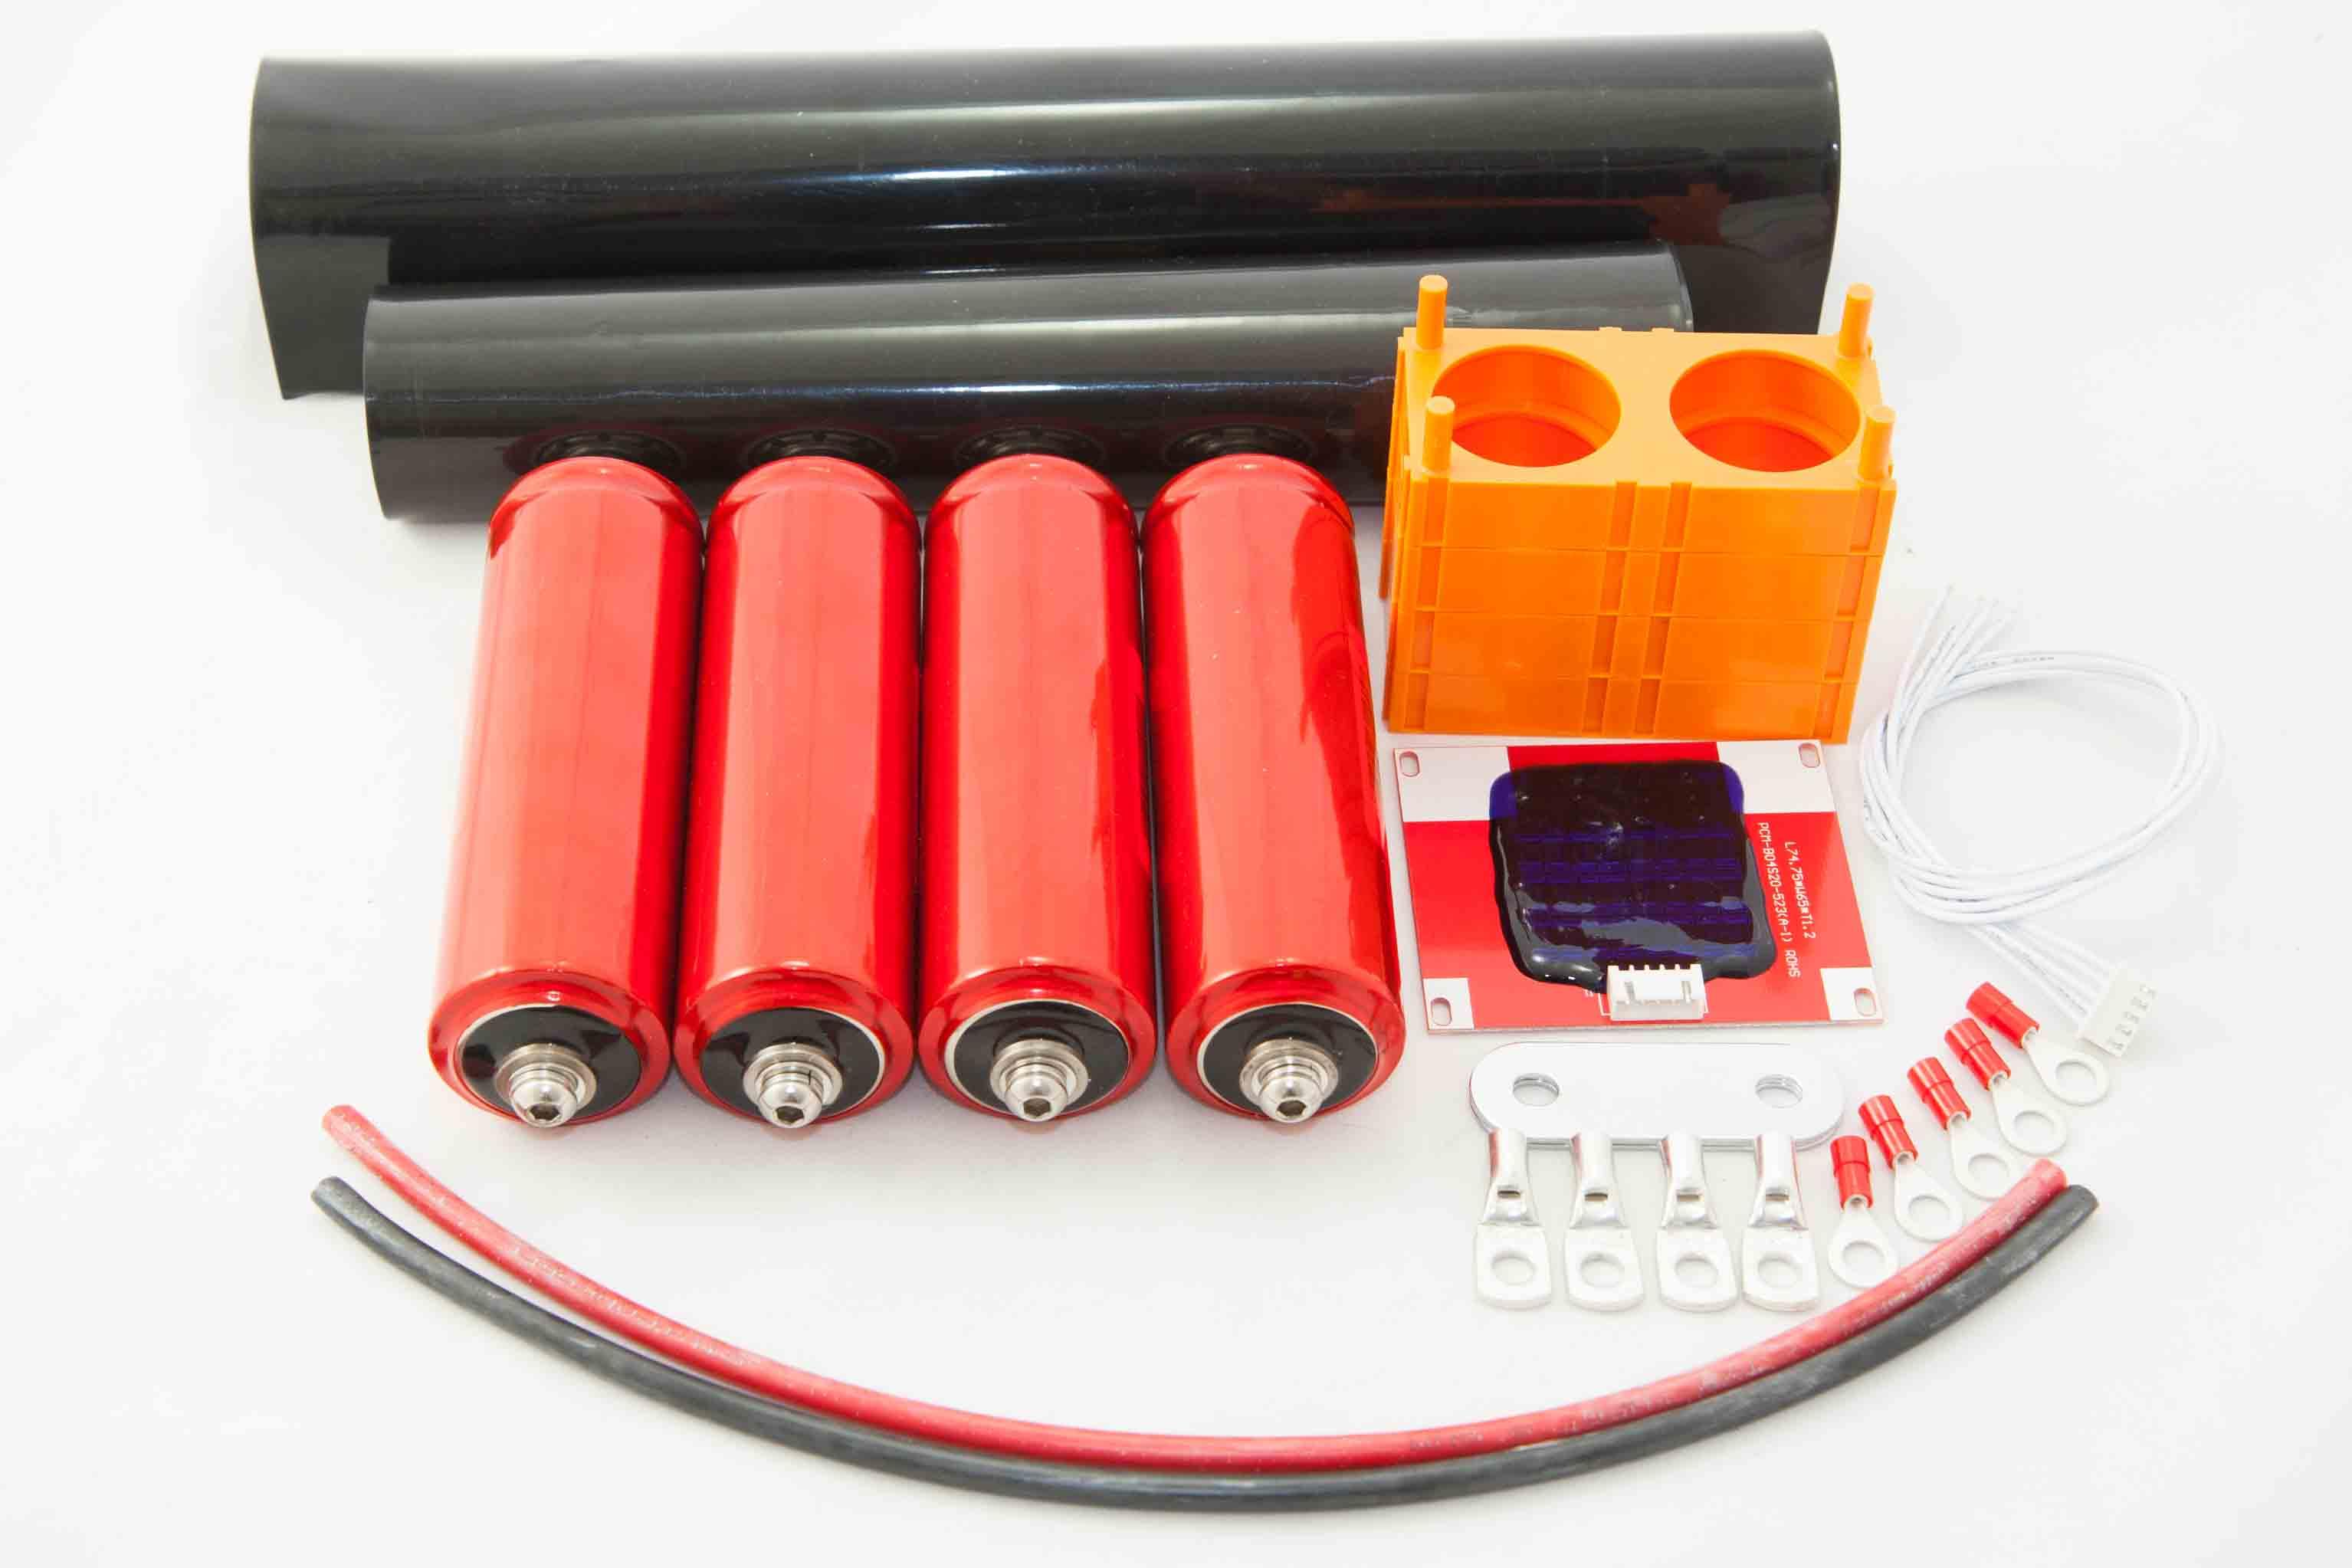 bausatz lifepo4 starterbatterie 12v 8ah mit balancer i tecc lifeenergy. Black Bedroom Furniture Sets. Home Design Ideas